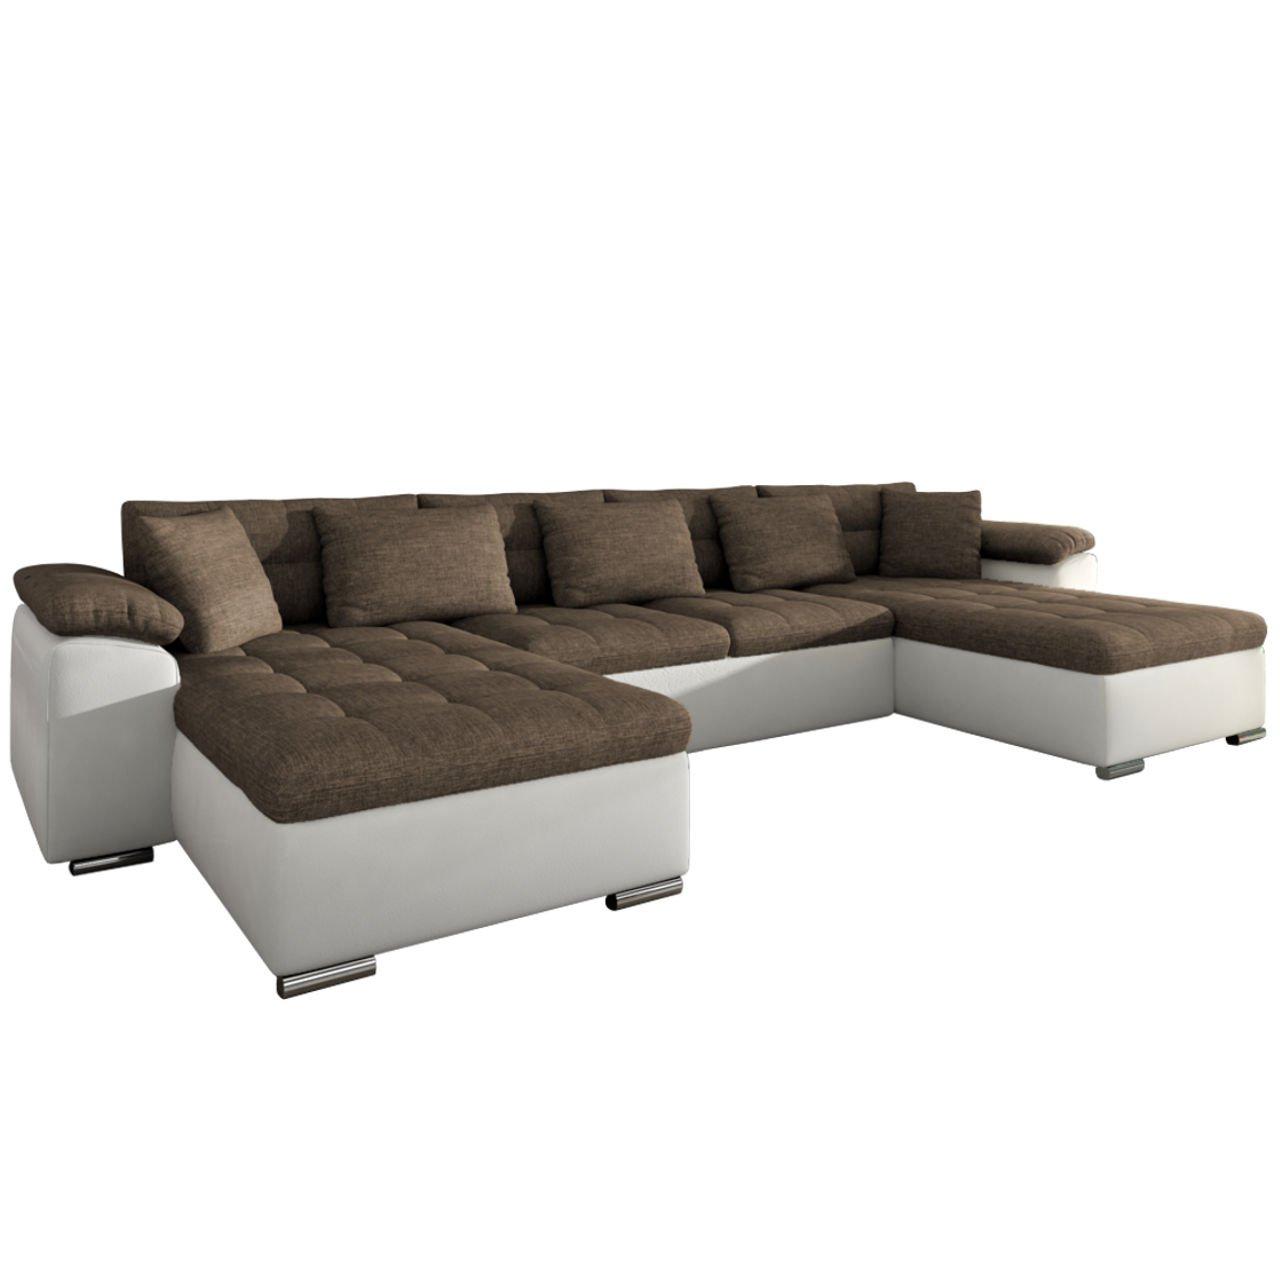 ecksofa wicenza design big sofa eckcouch couch mit. Black Bedroom Furniture Sets. Home Design Ideas